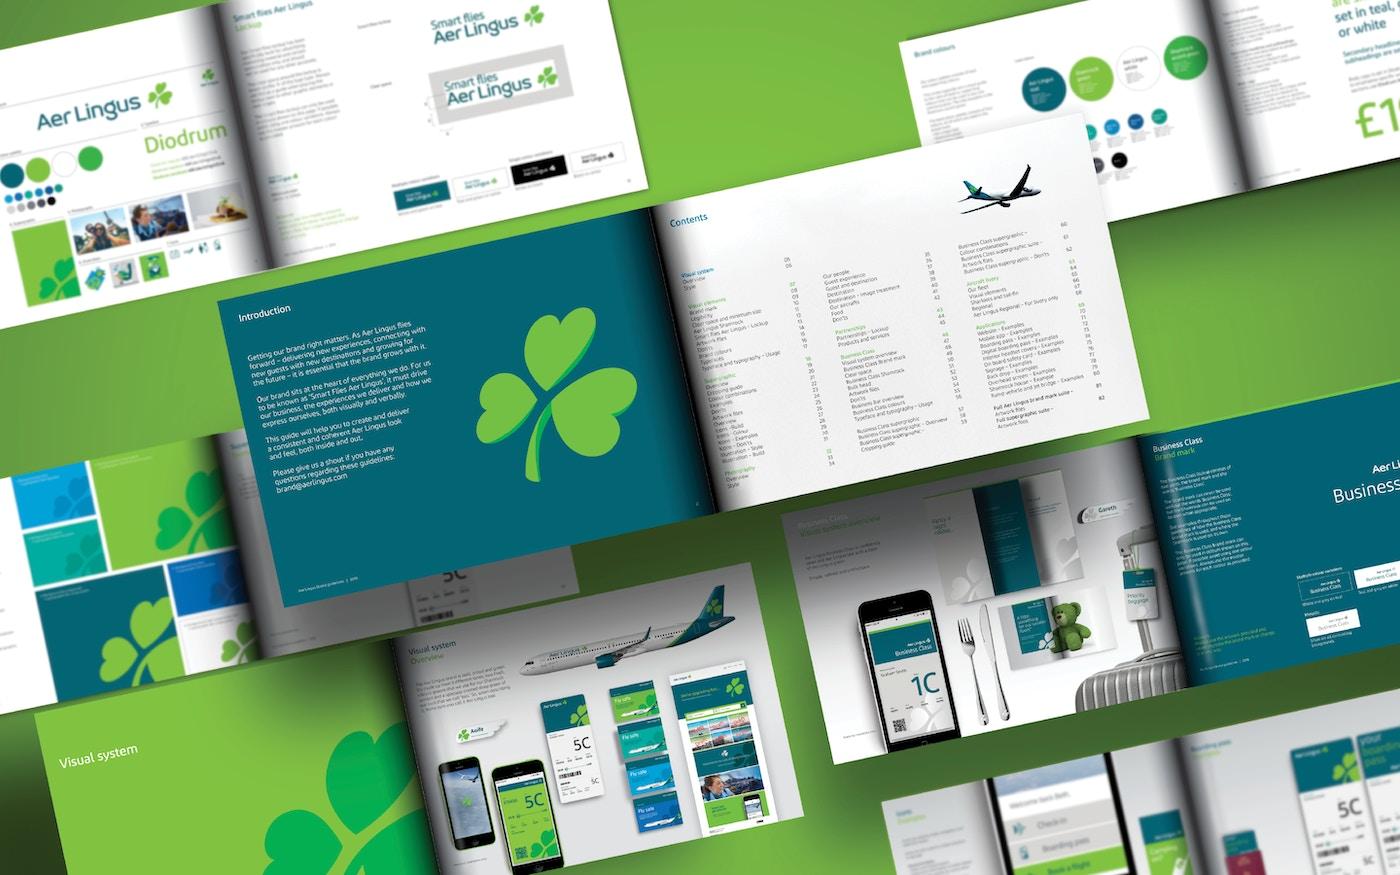 Aer Lingus visual system design